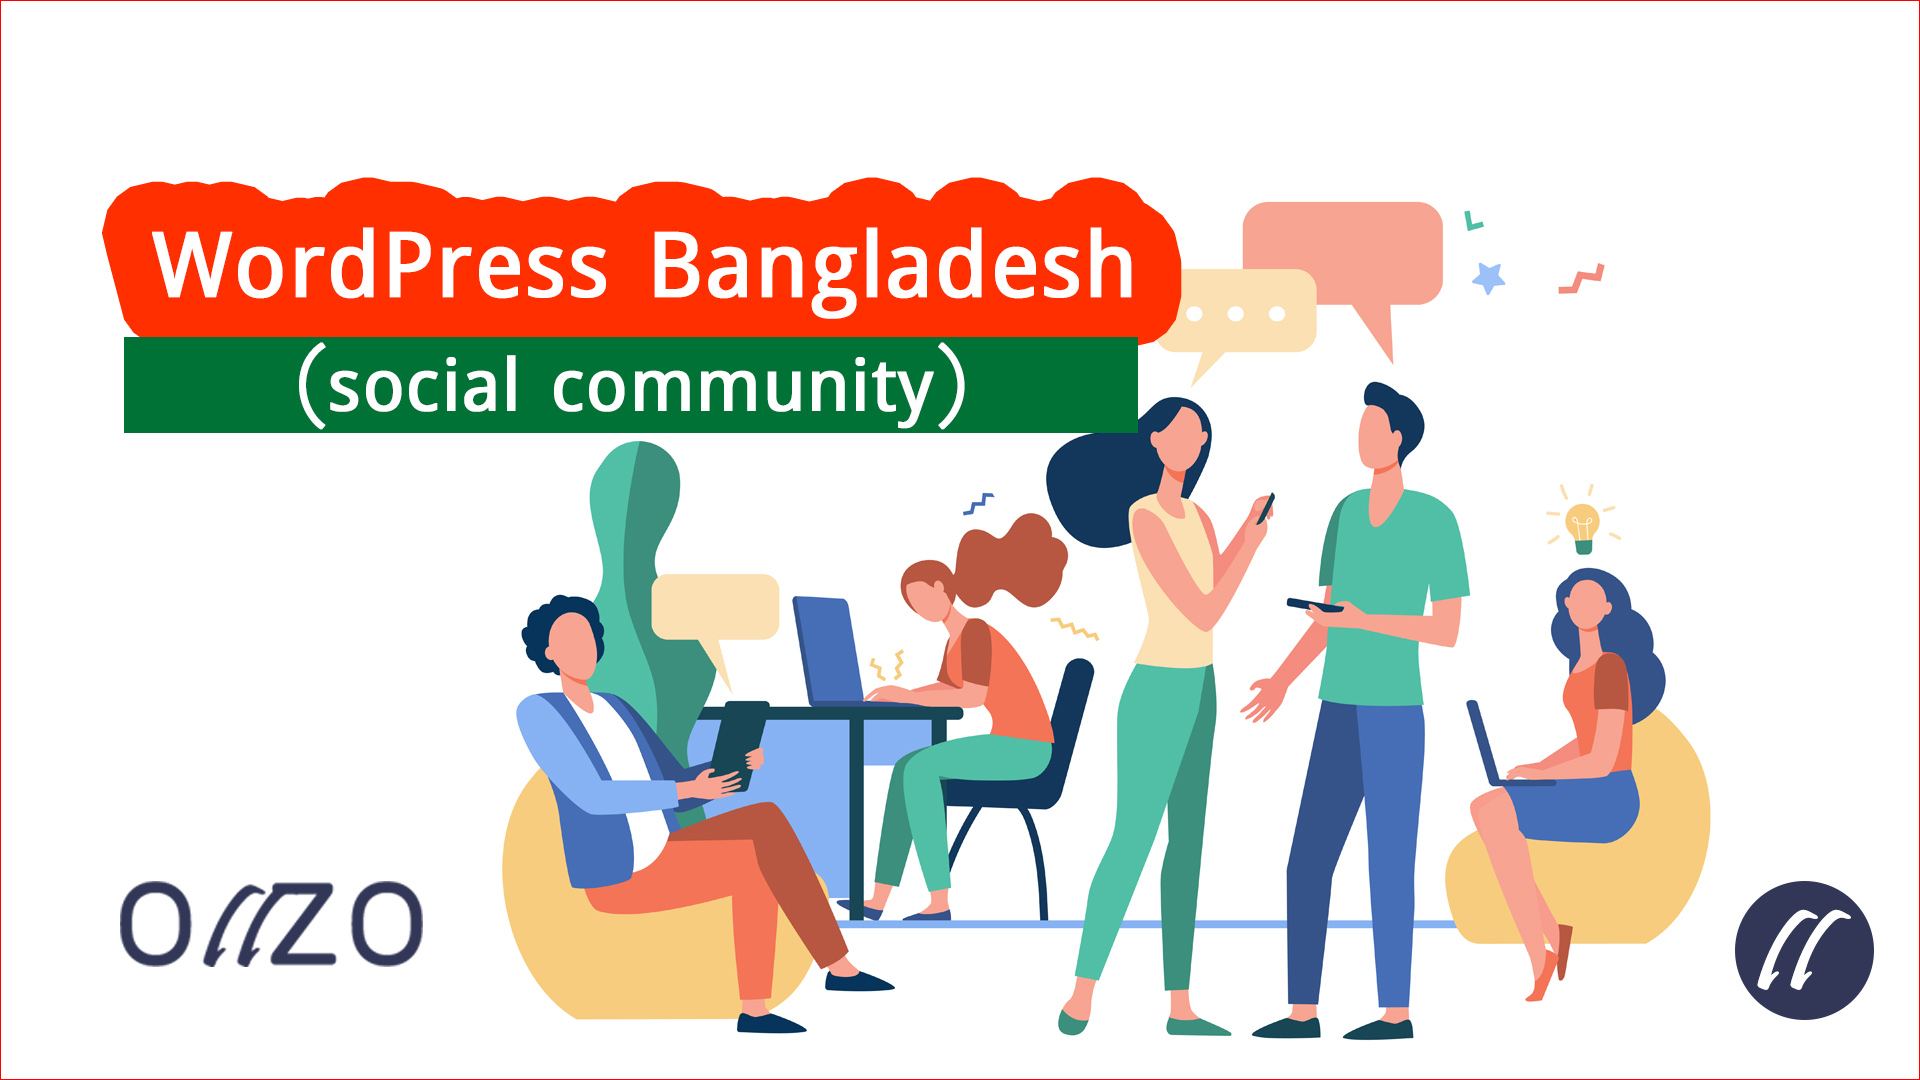 WordPress Bangladesh, Ollzo.com